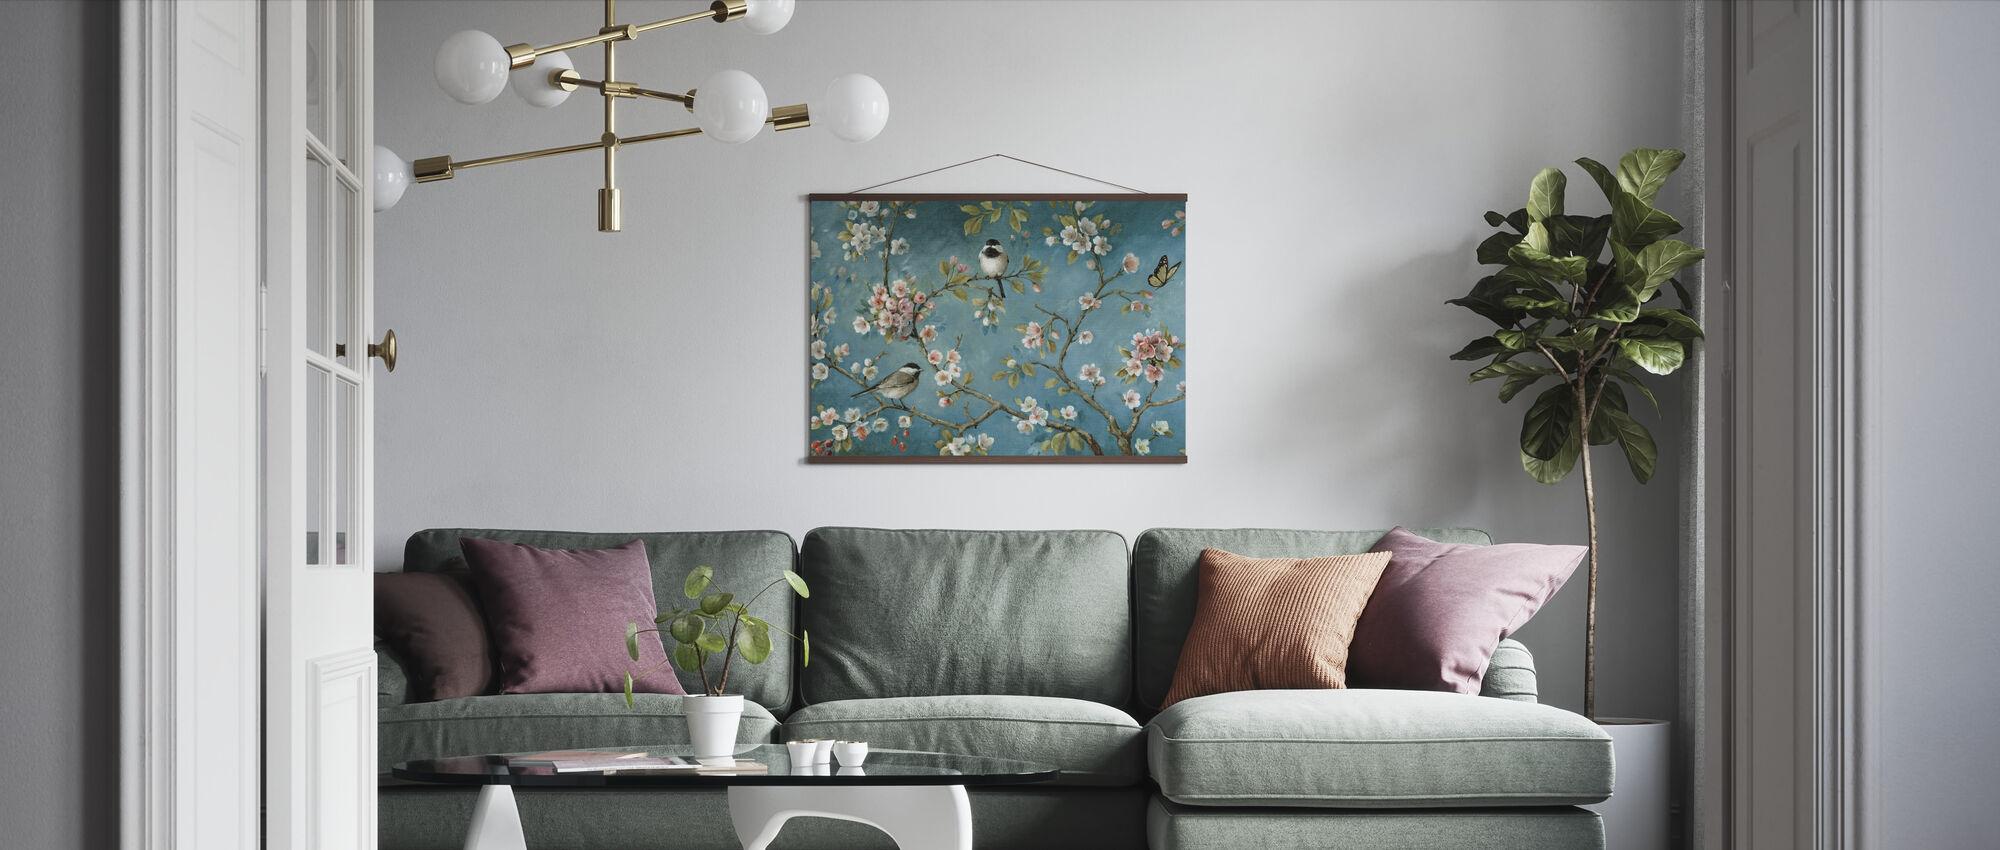 Blossom - Poster - Living Room